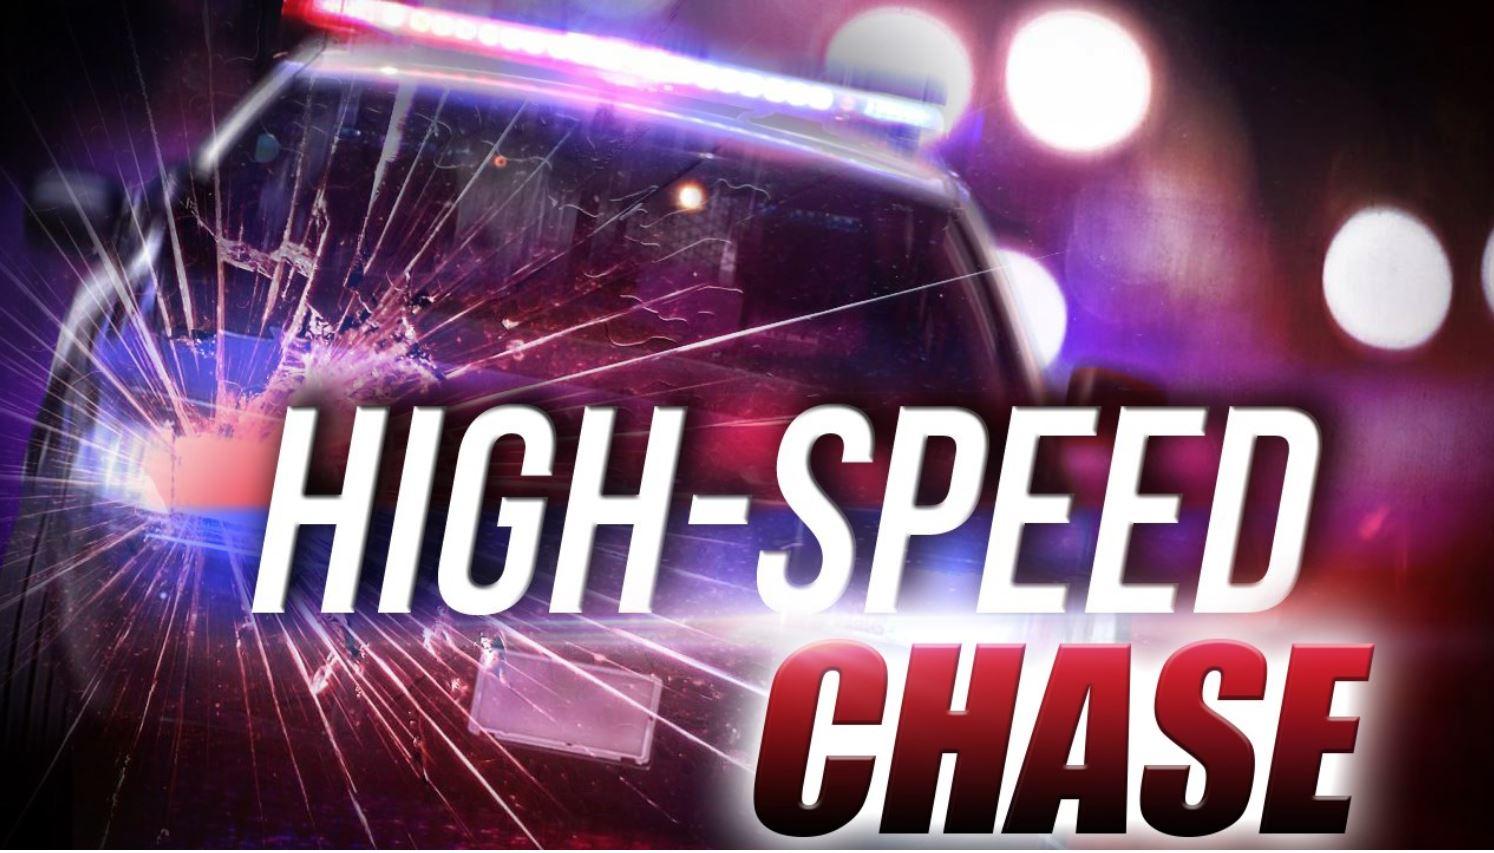 High speed chase 7-8-17_1536438262944.JPG.jpg